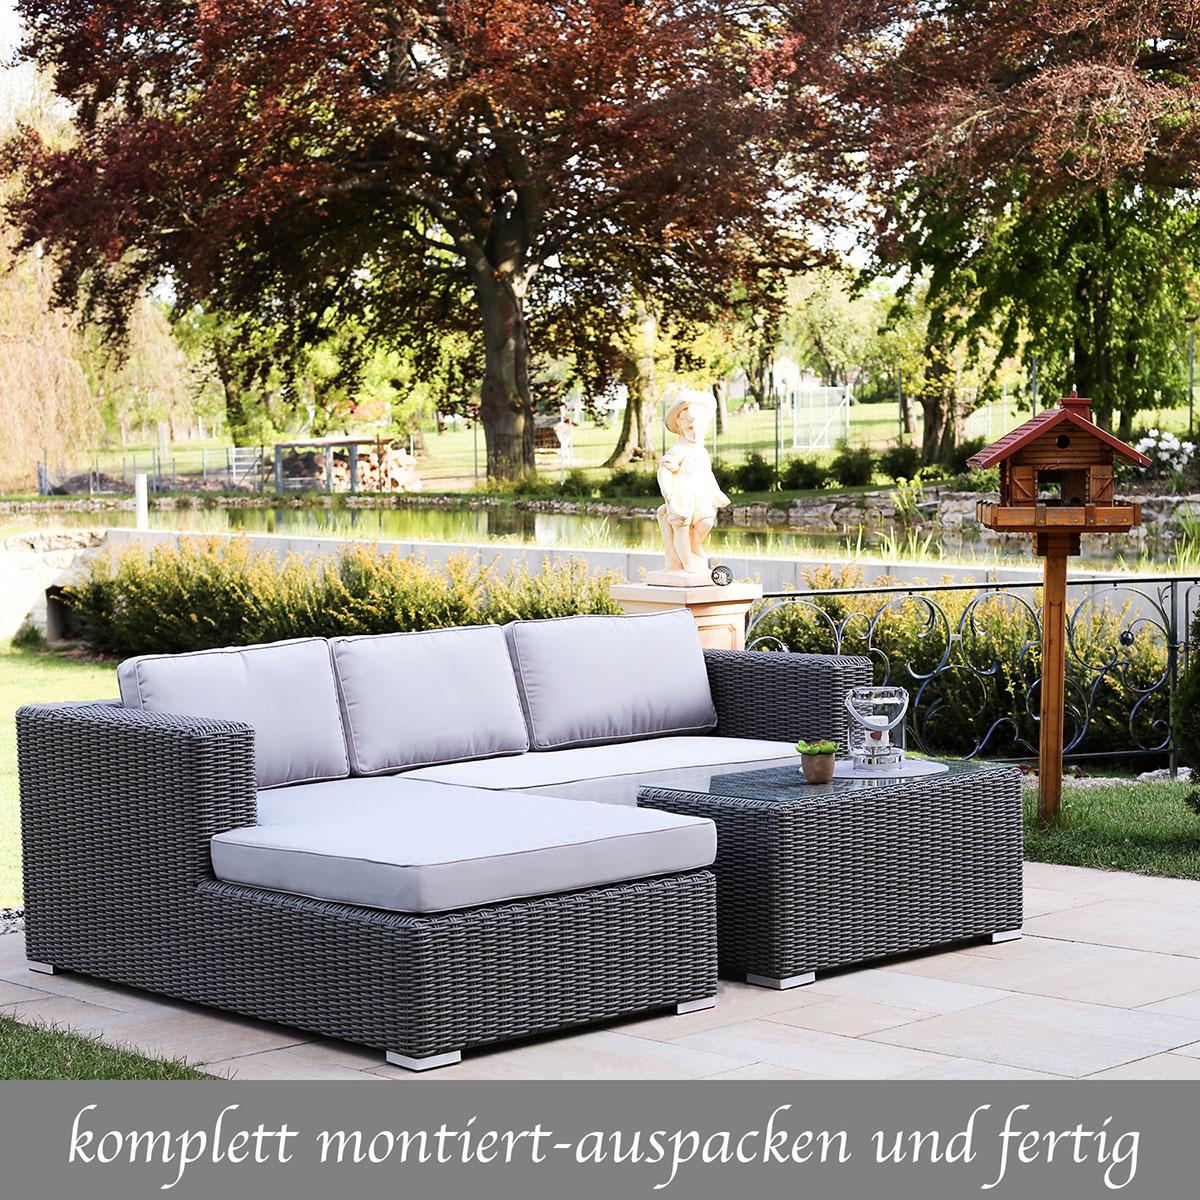 Terrassenmöbel Lounge Wetterfest | ambiznes.com